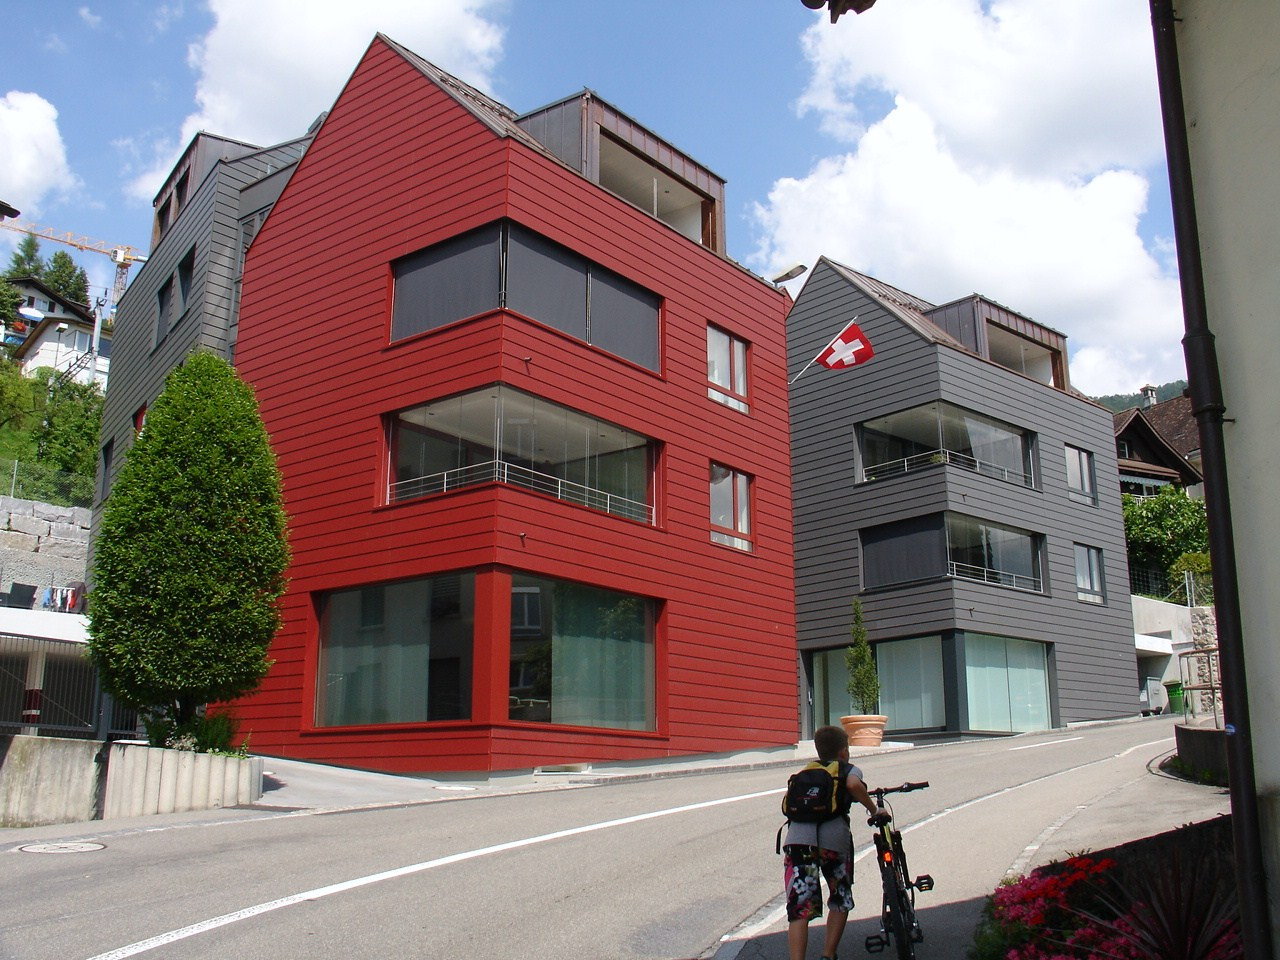 Heinzer Bedachungen & Fassaden GmbH